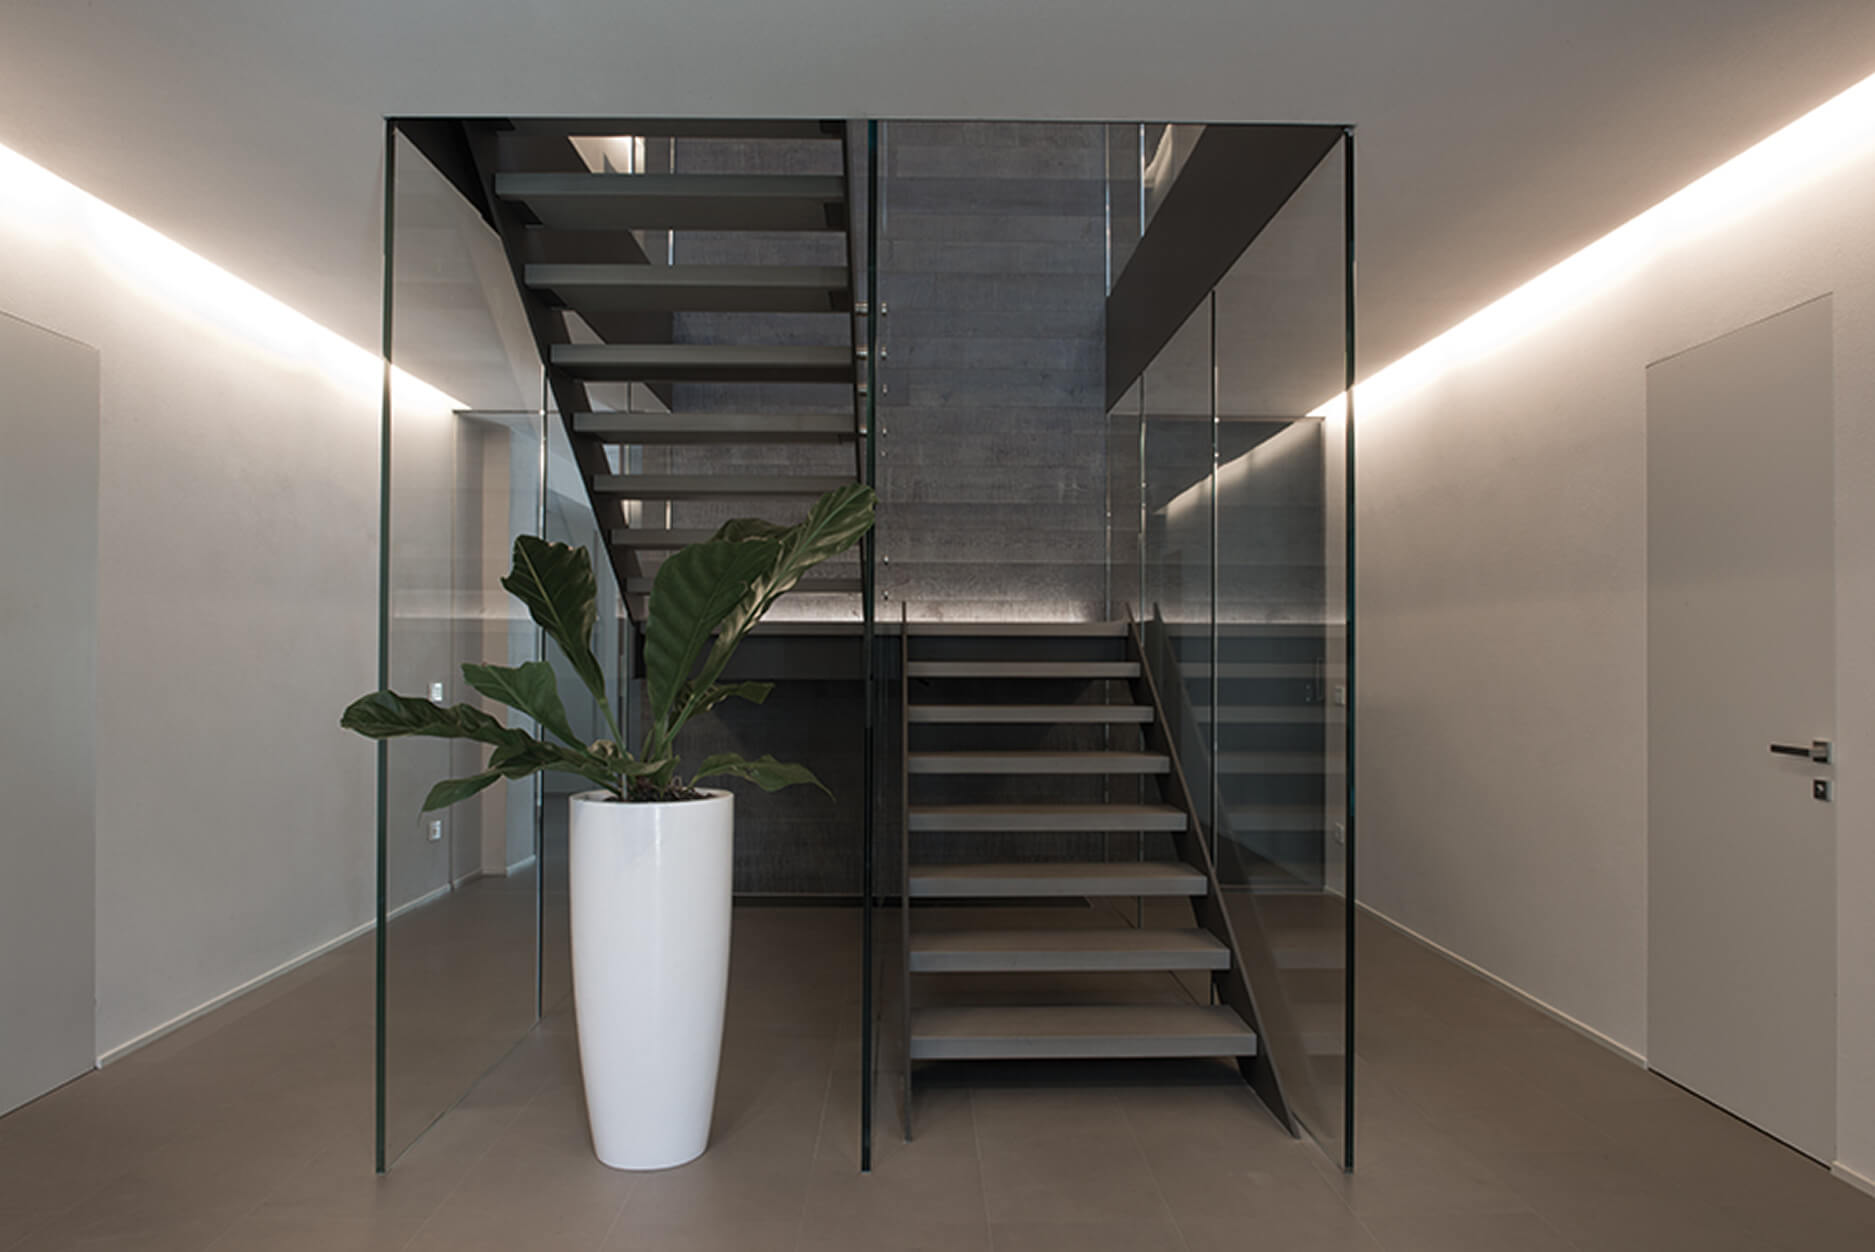 pareti interne in vetro, pareti interne in cristallo, parapetto per scala in vetro, parapetto per scala in cristallo